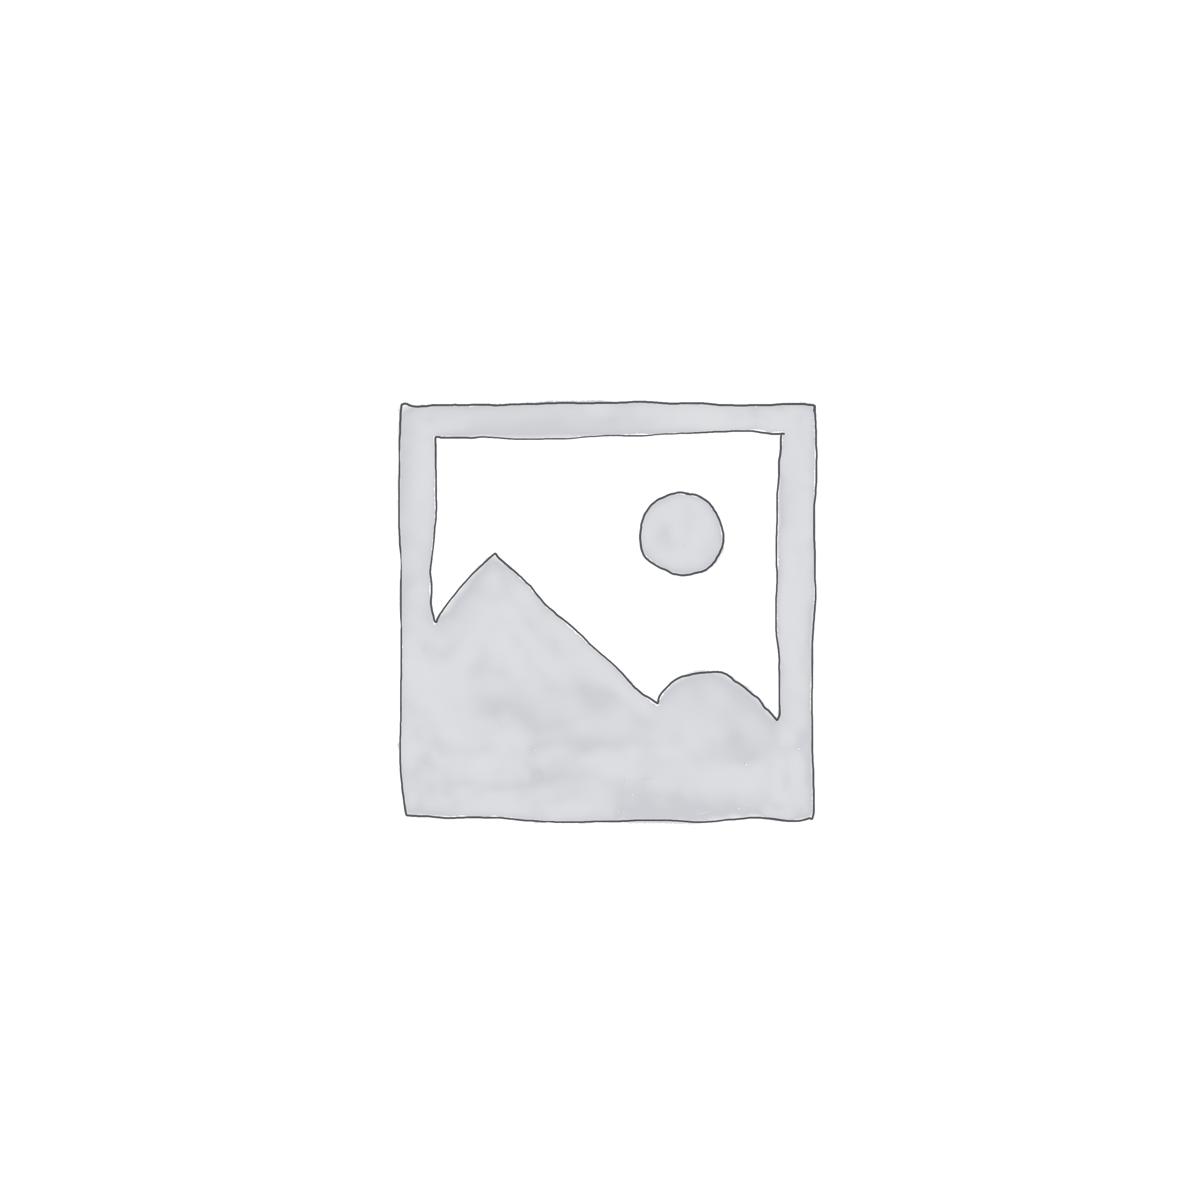 Soft Marbling Wallpaper Mural